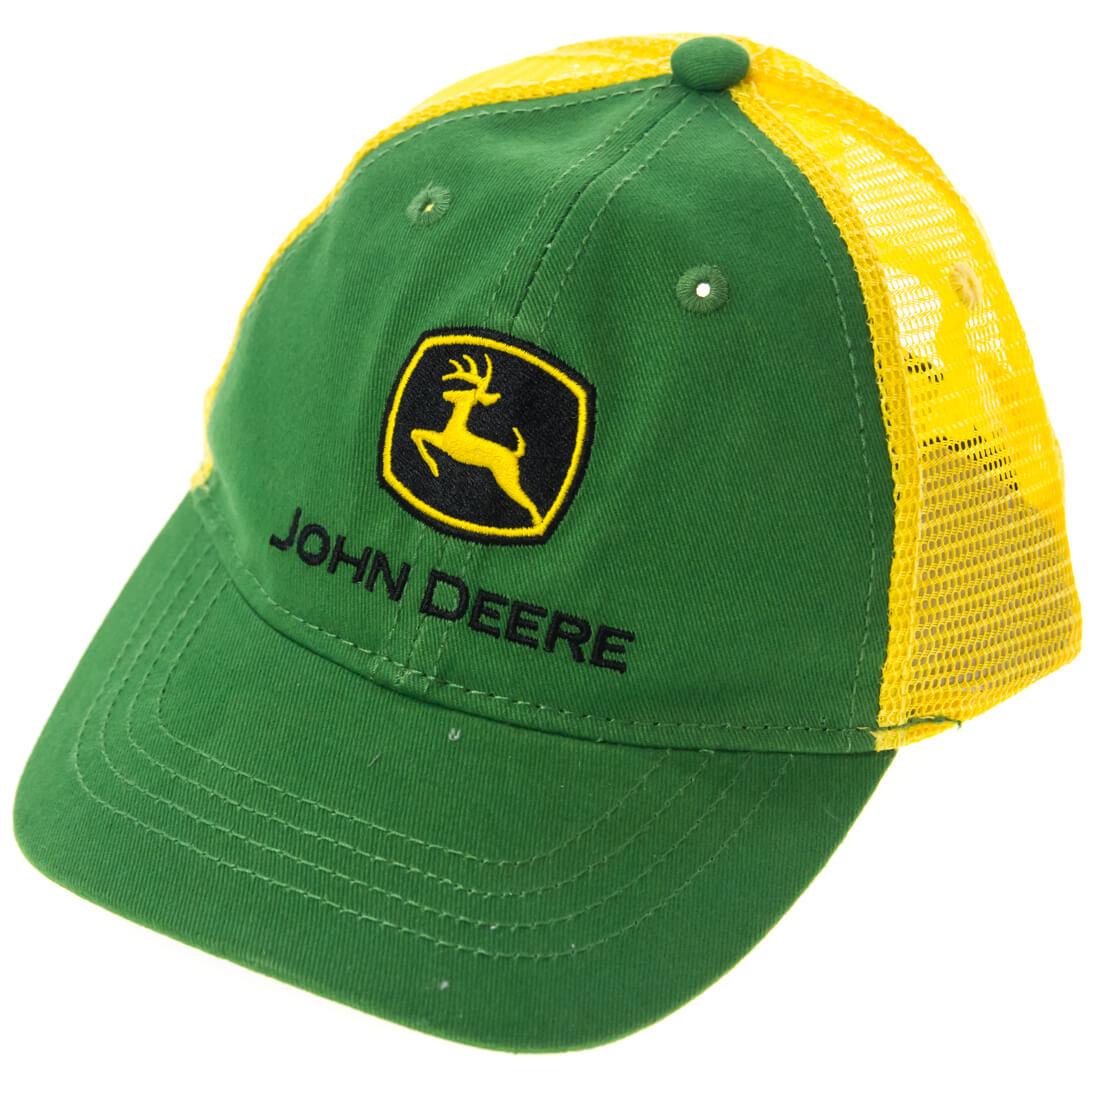 John Deere Trucker Hat